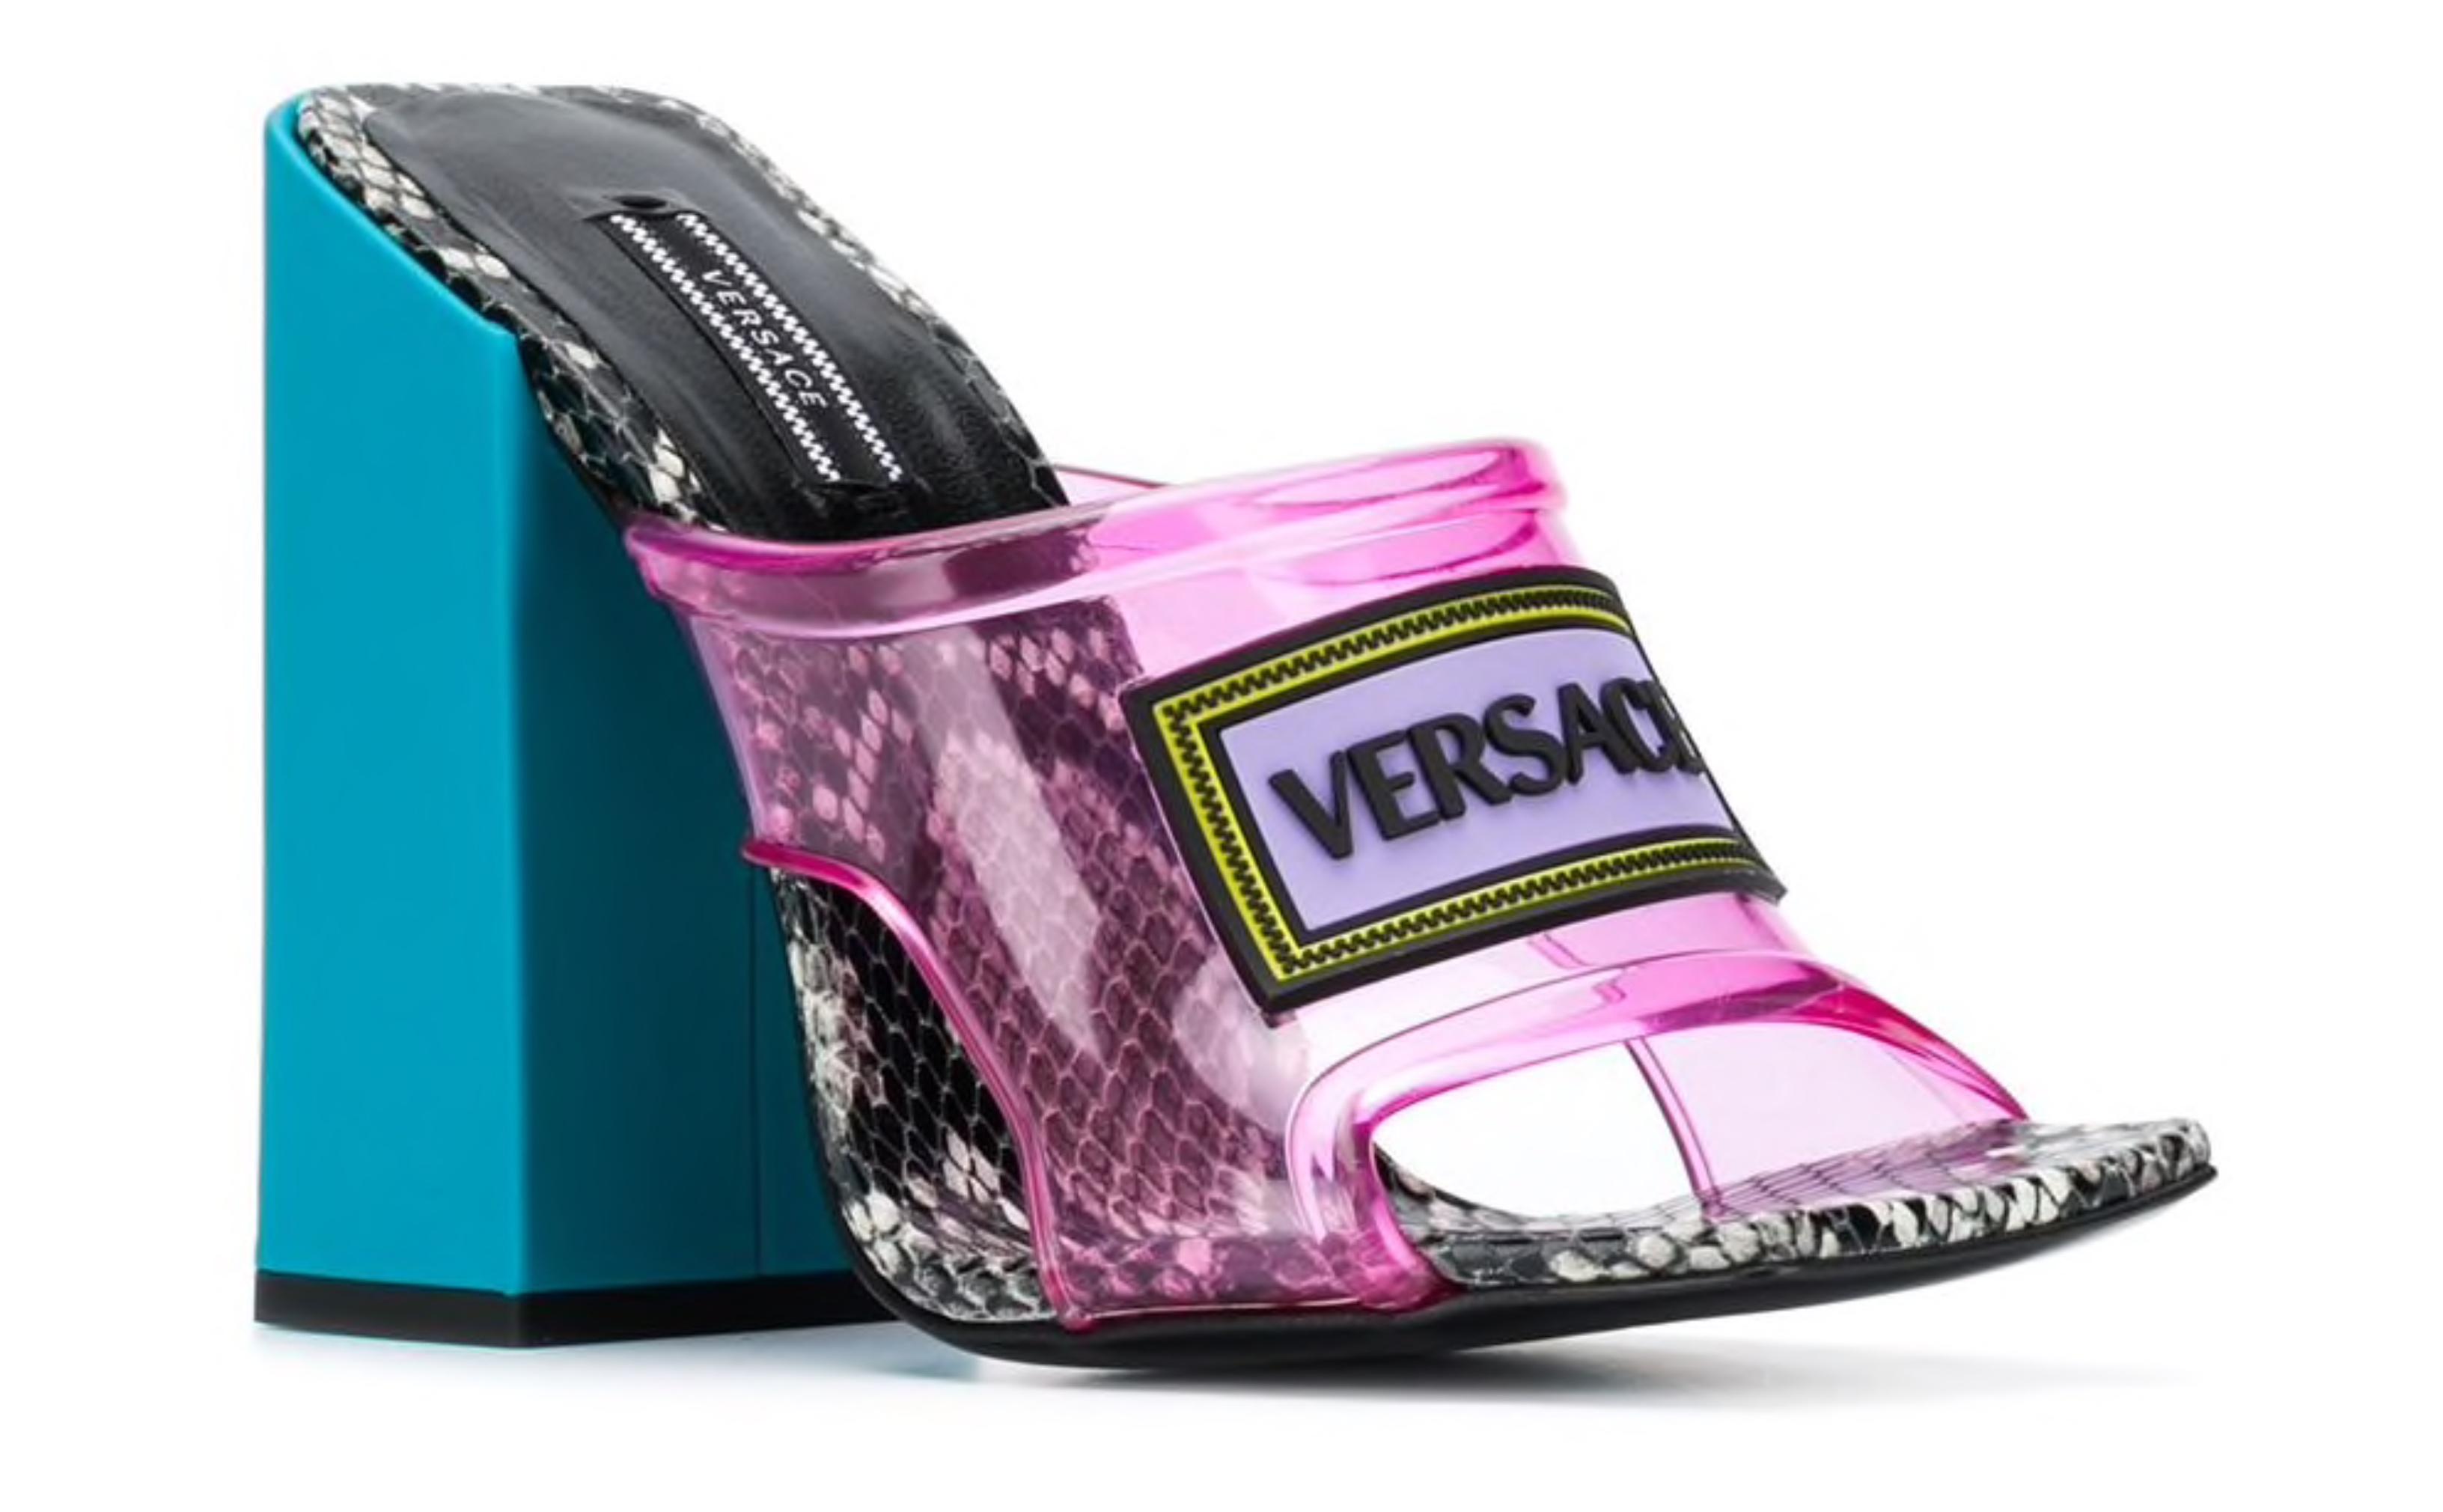 versace jelly heels off 65% - www